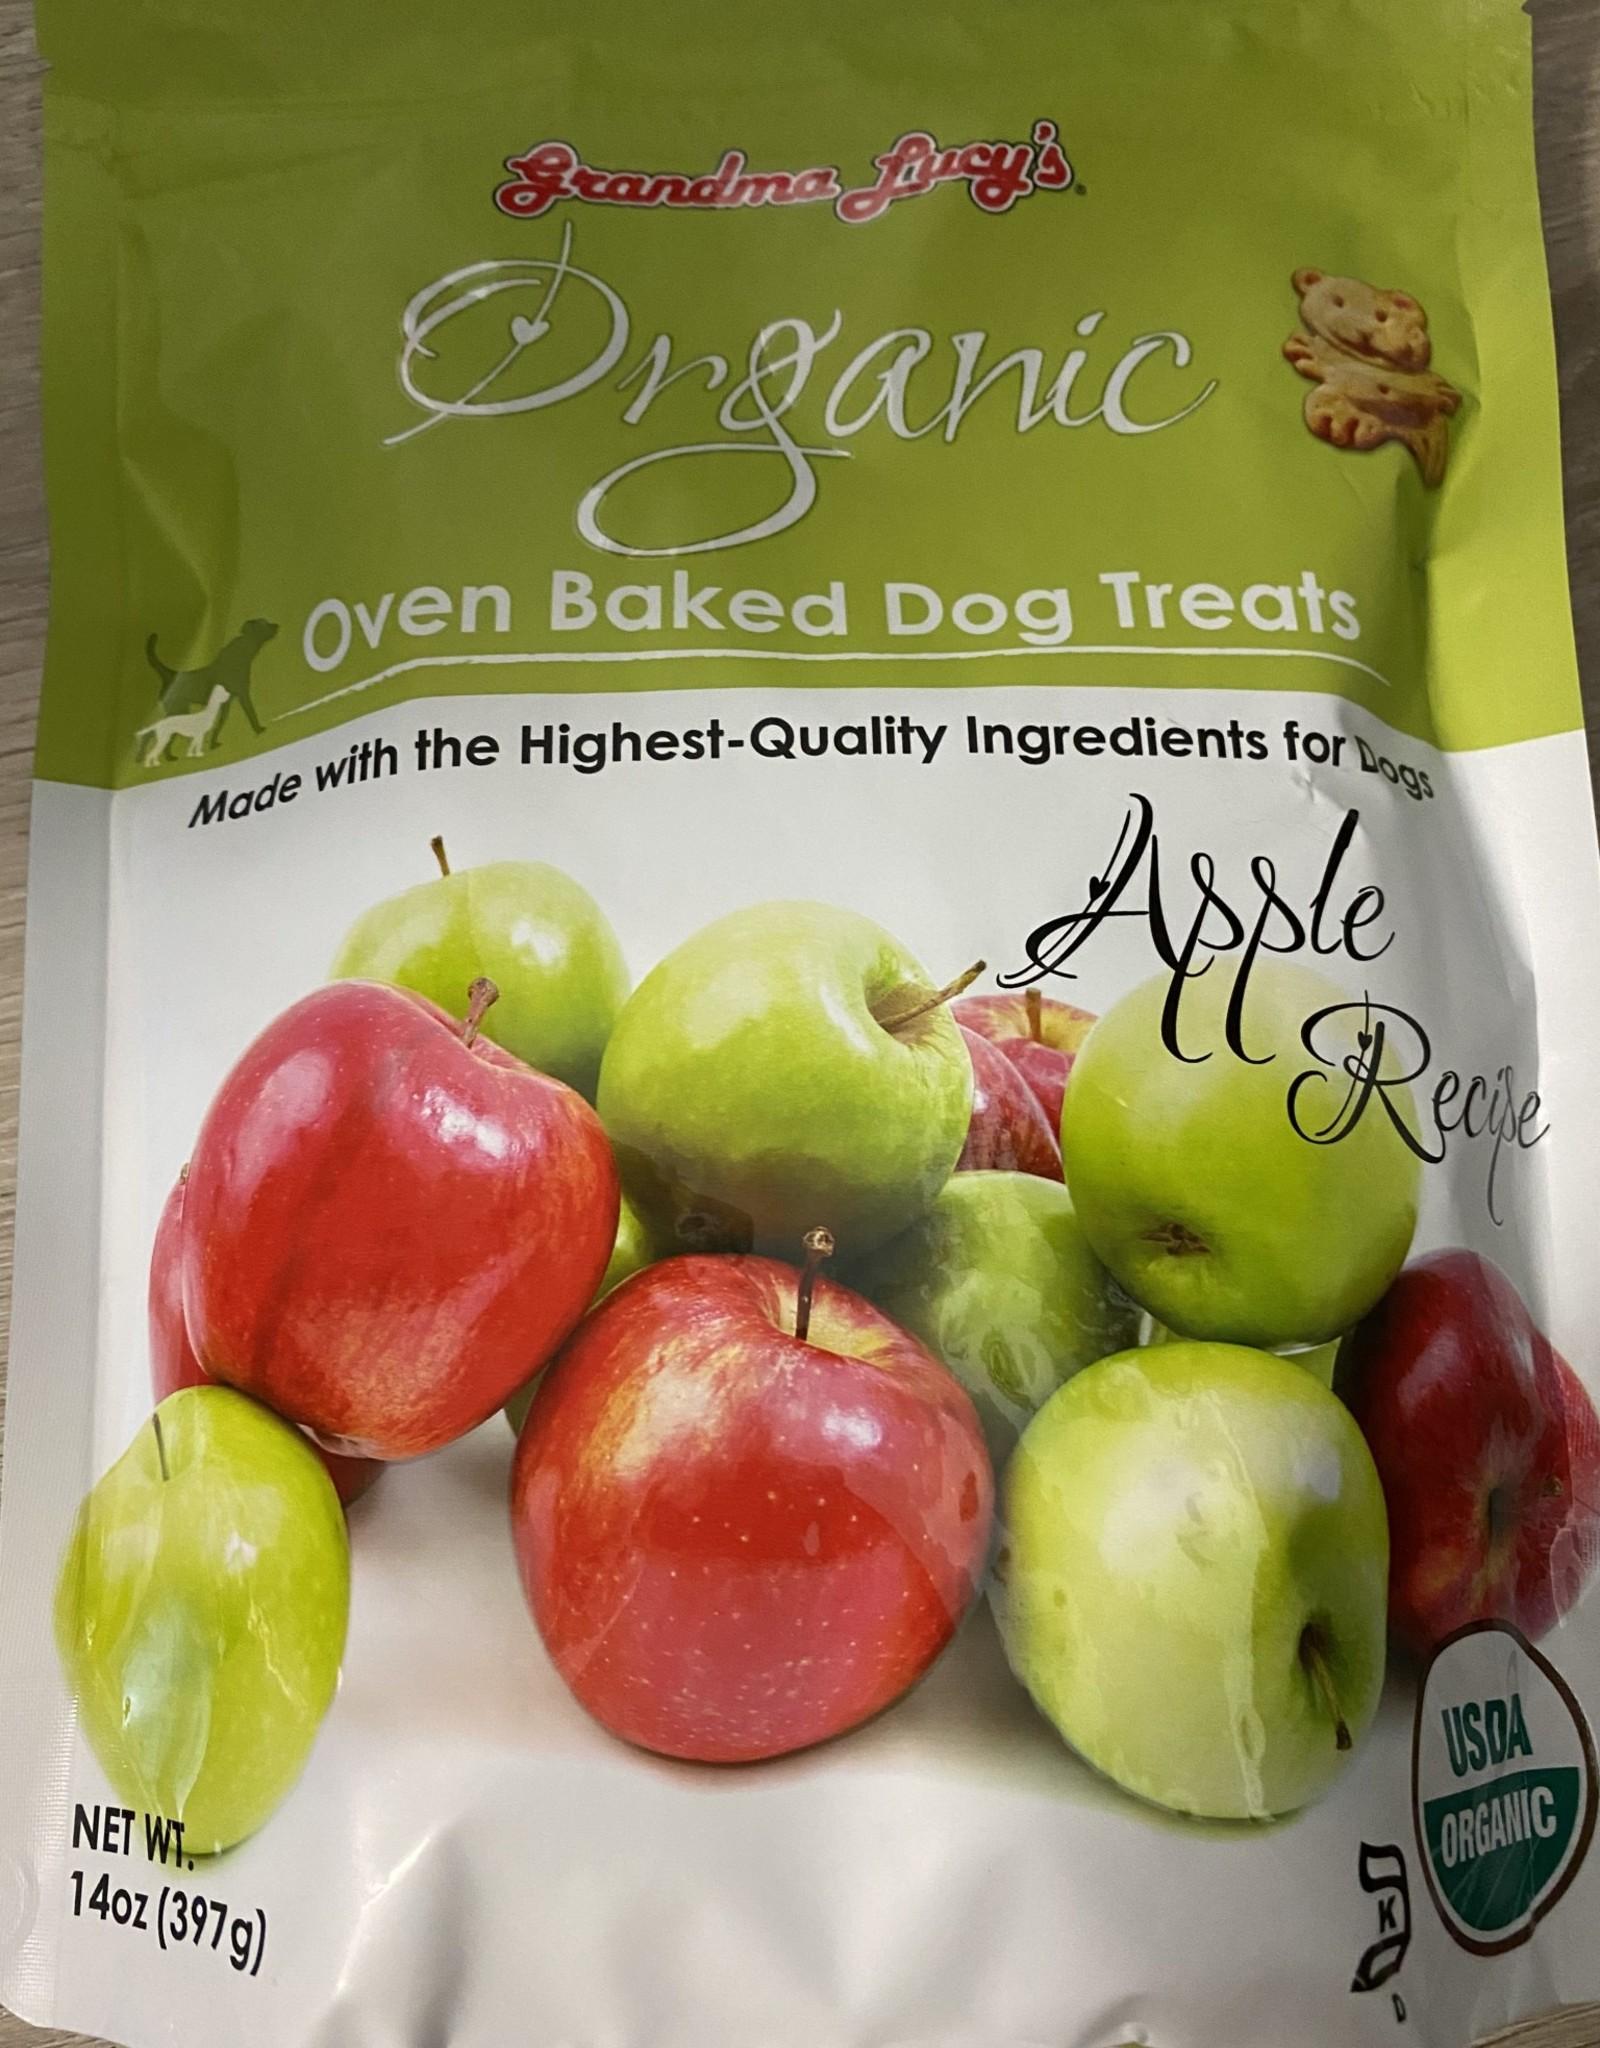 Grandma Lucys Organic Baked Treats - Apple